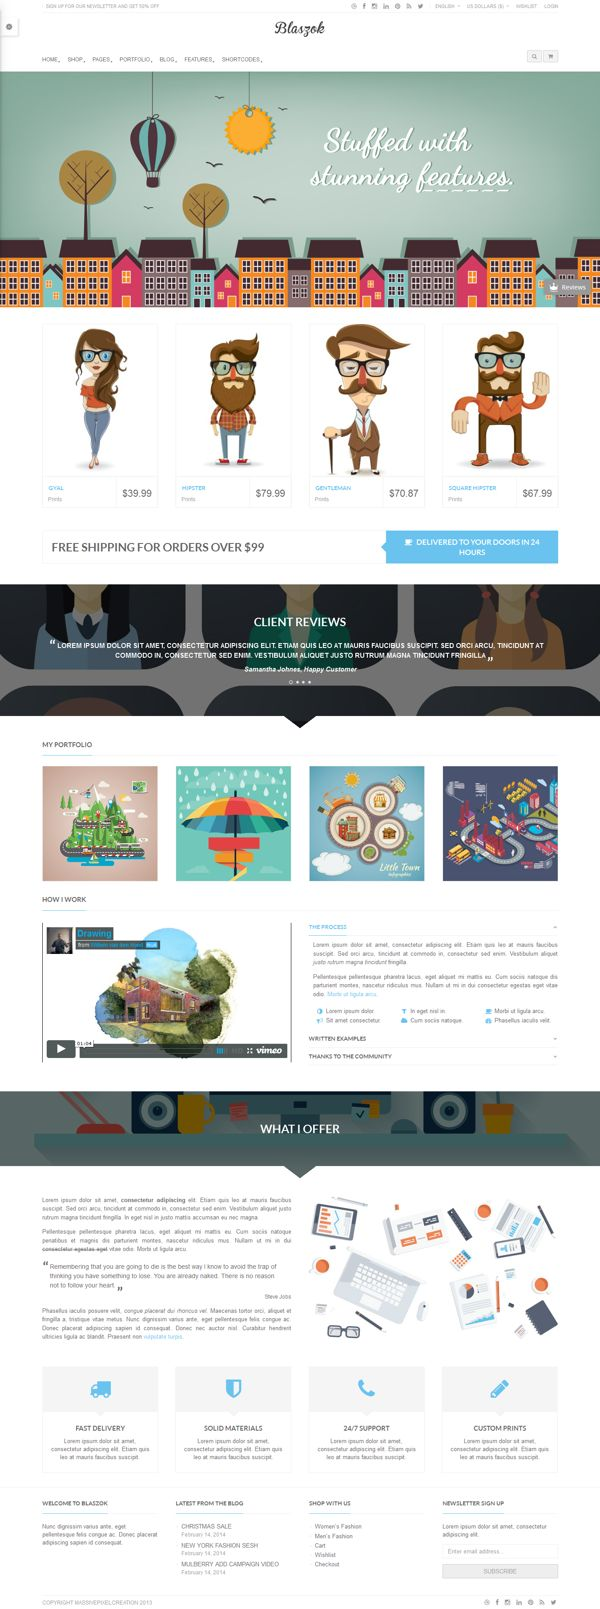 Blaszok - Ultimate WP Theme by Themes Awards, via Behance